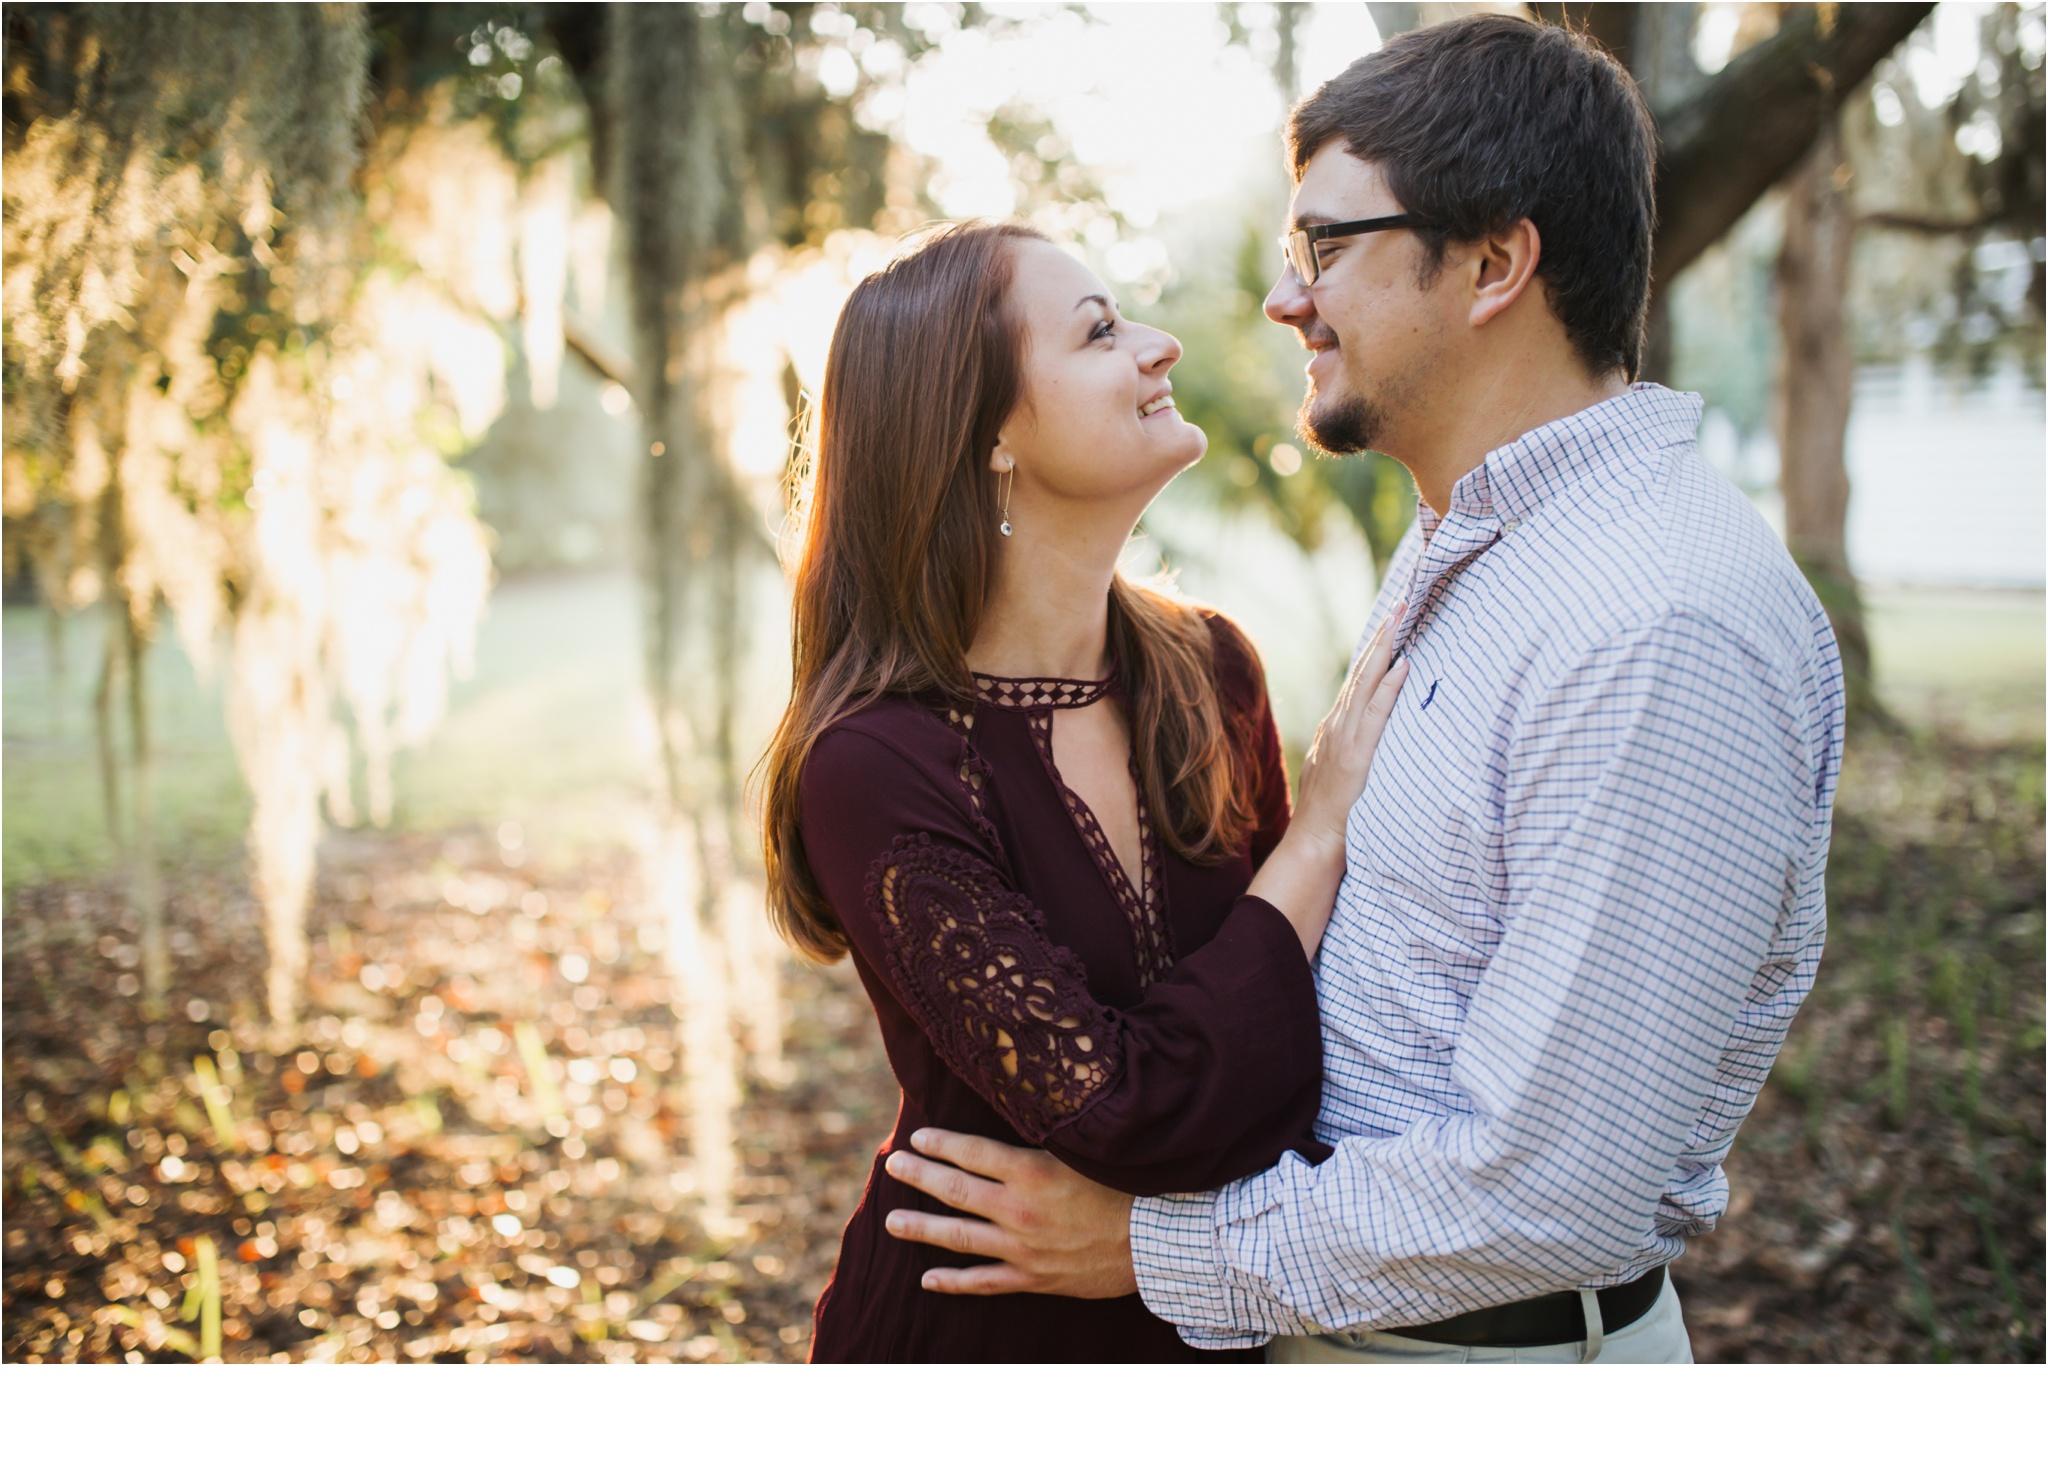 Rainey_Gregg_Photography_St._Simons_Island_Georgia_California_Wedding_Portrait_Photography_1370.jpg